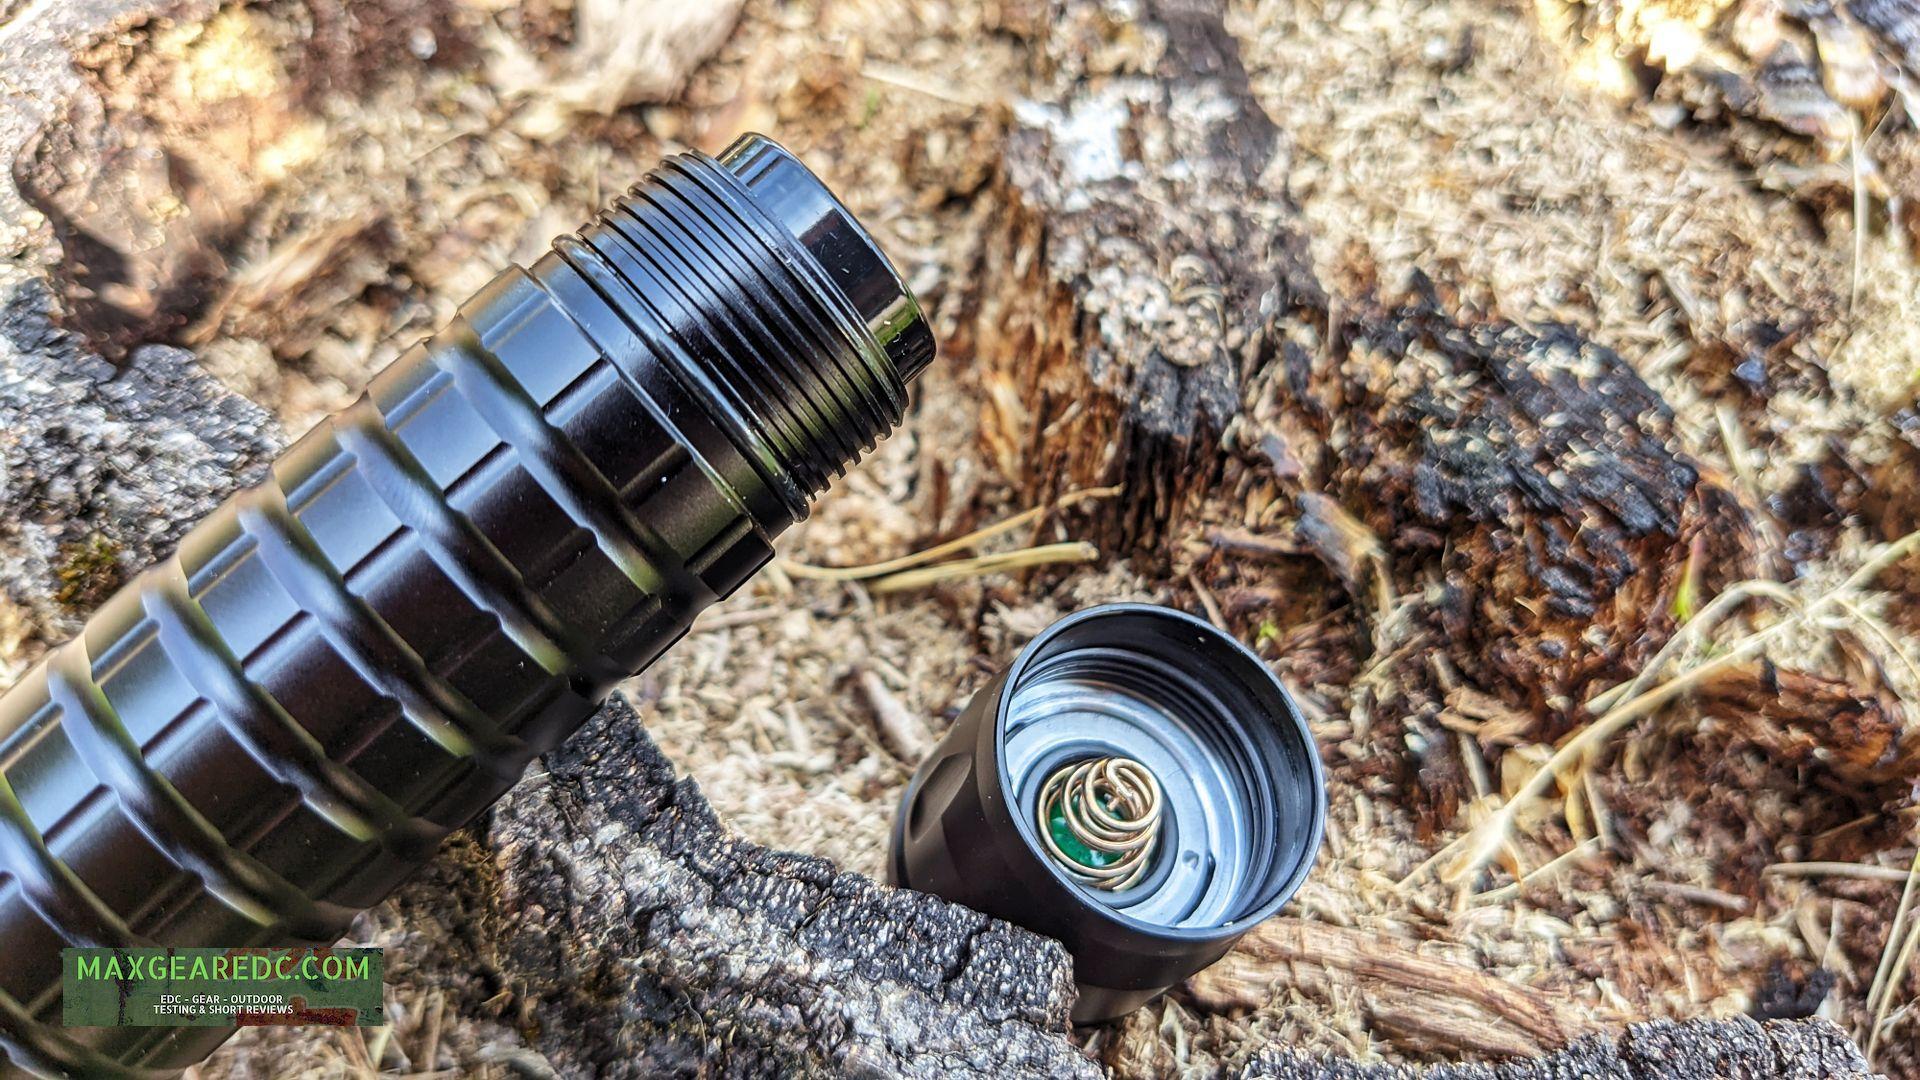 Sofirn_SF47W_flashlight_Review_21700_thrower_maxgearedc